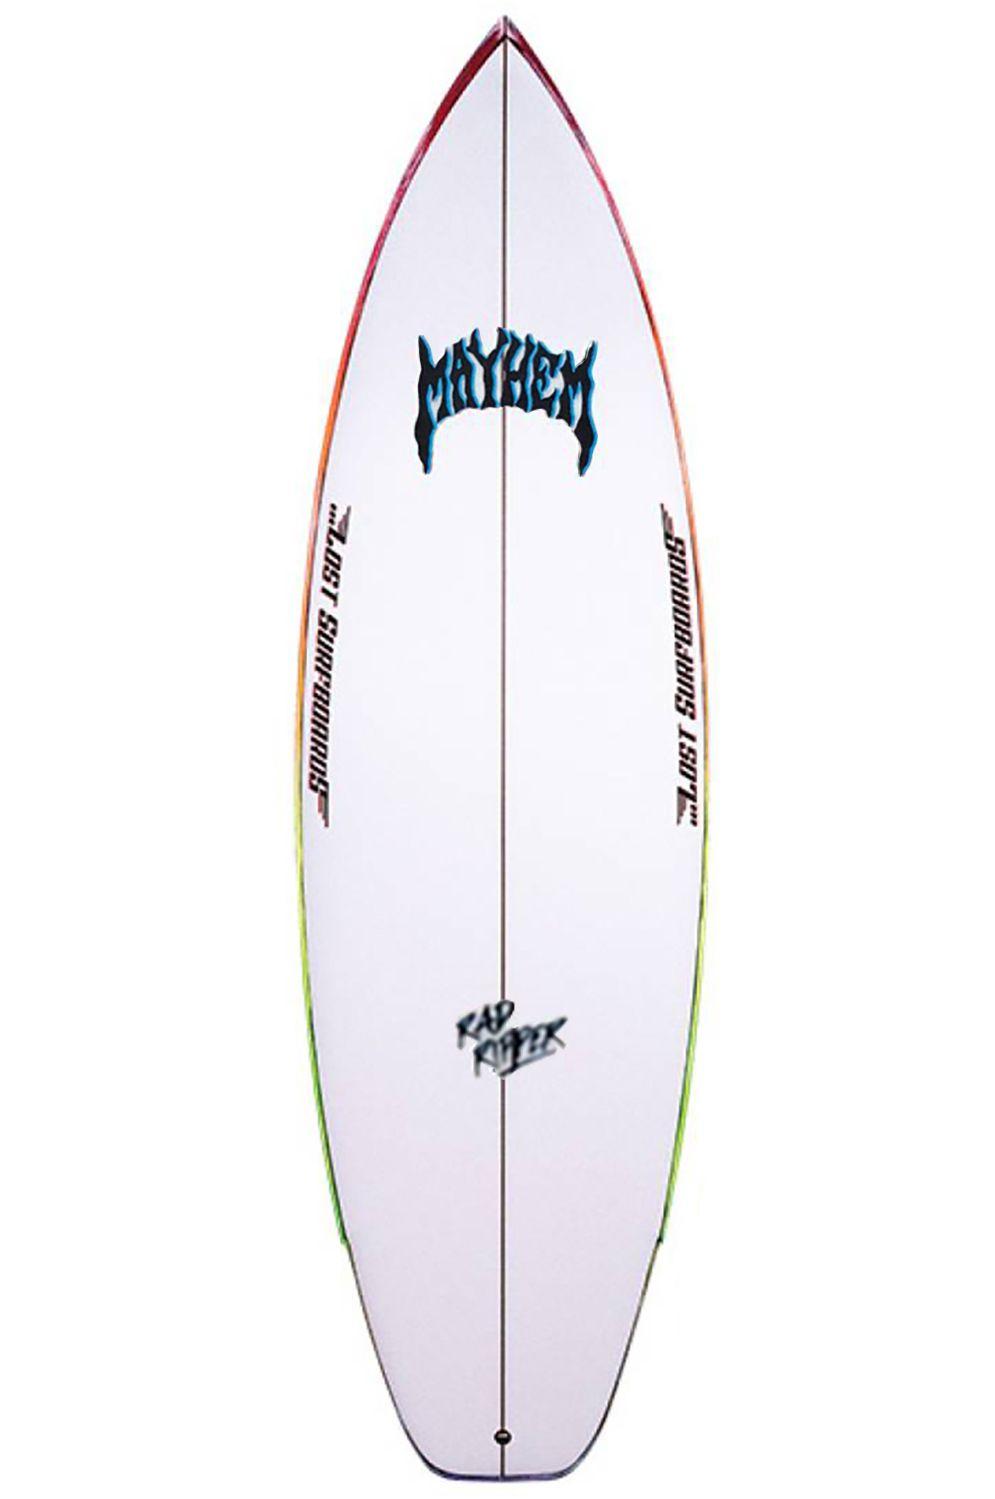 Lost Surf Board 6'1 RAD RIPPER Squash Tail - Color FCS II Multisystem 6ft1